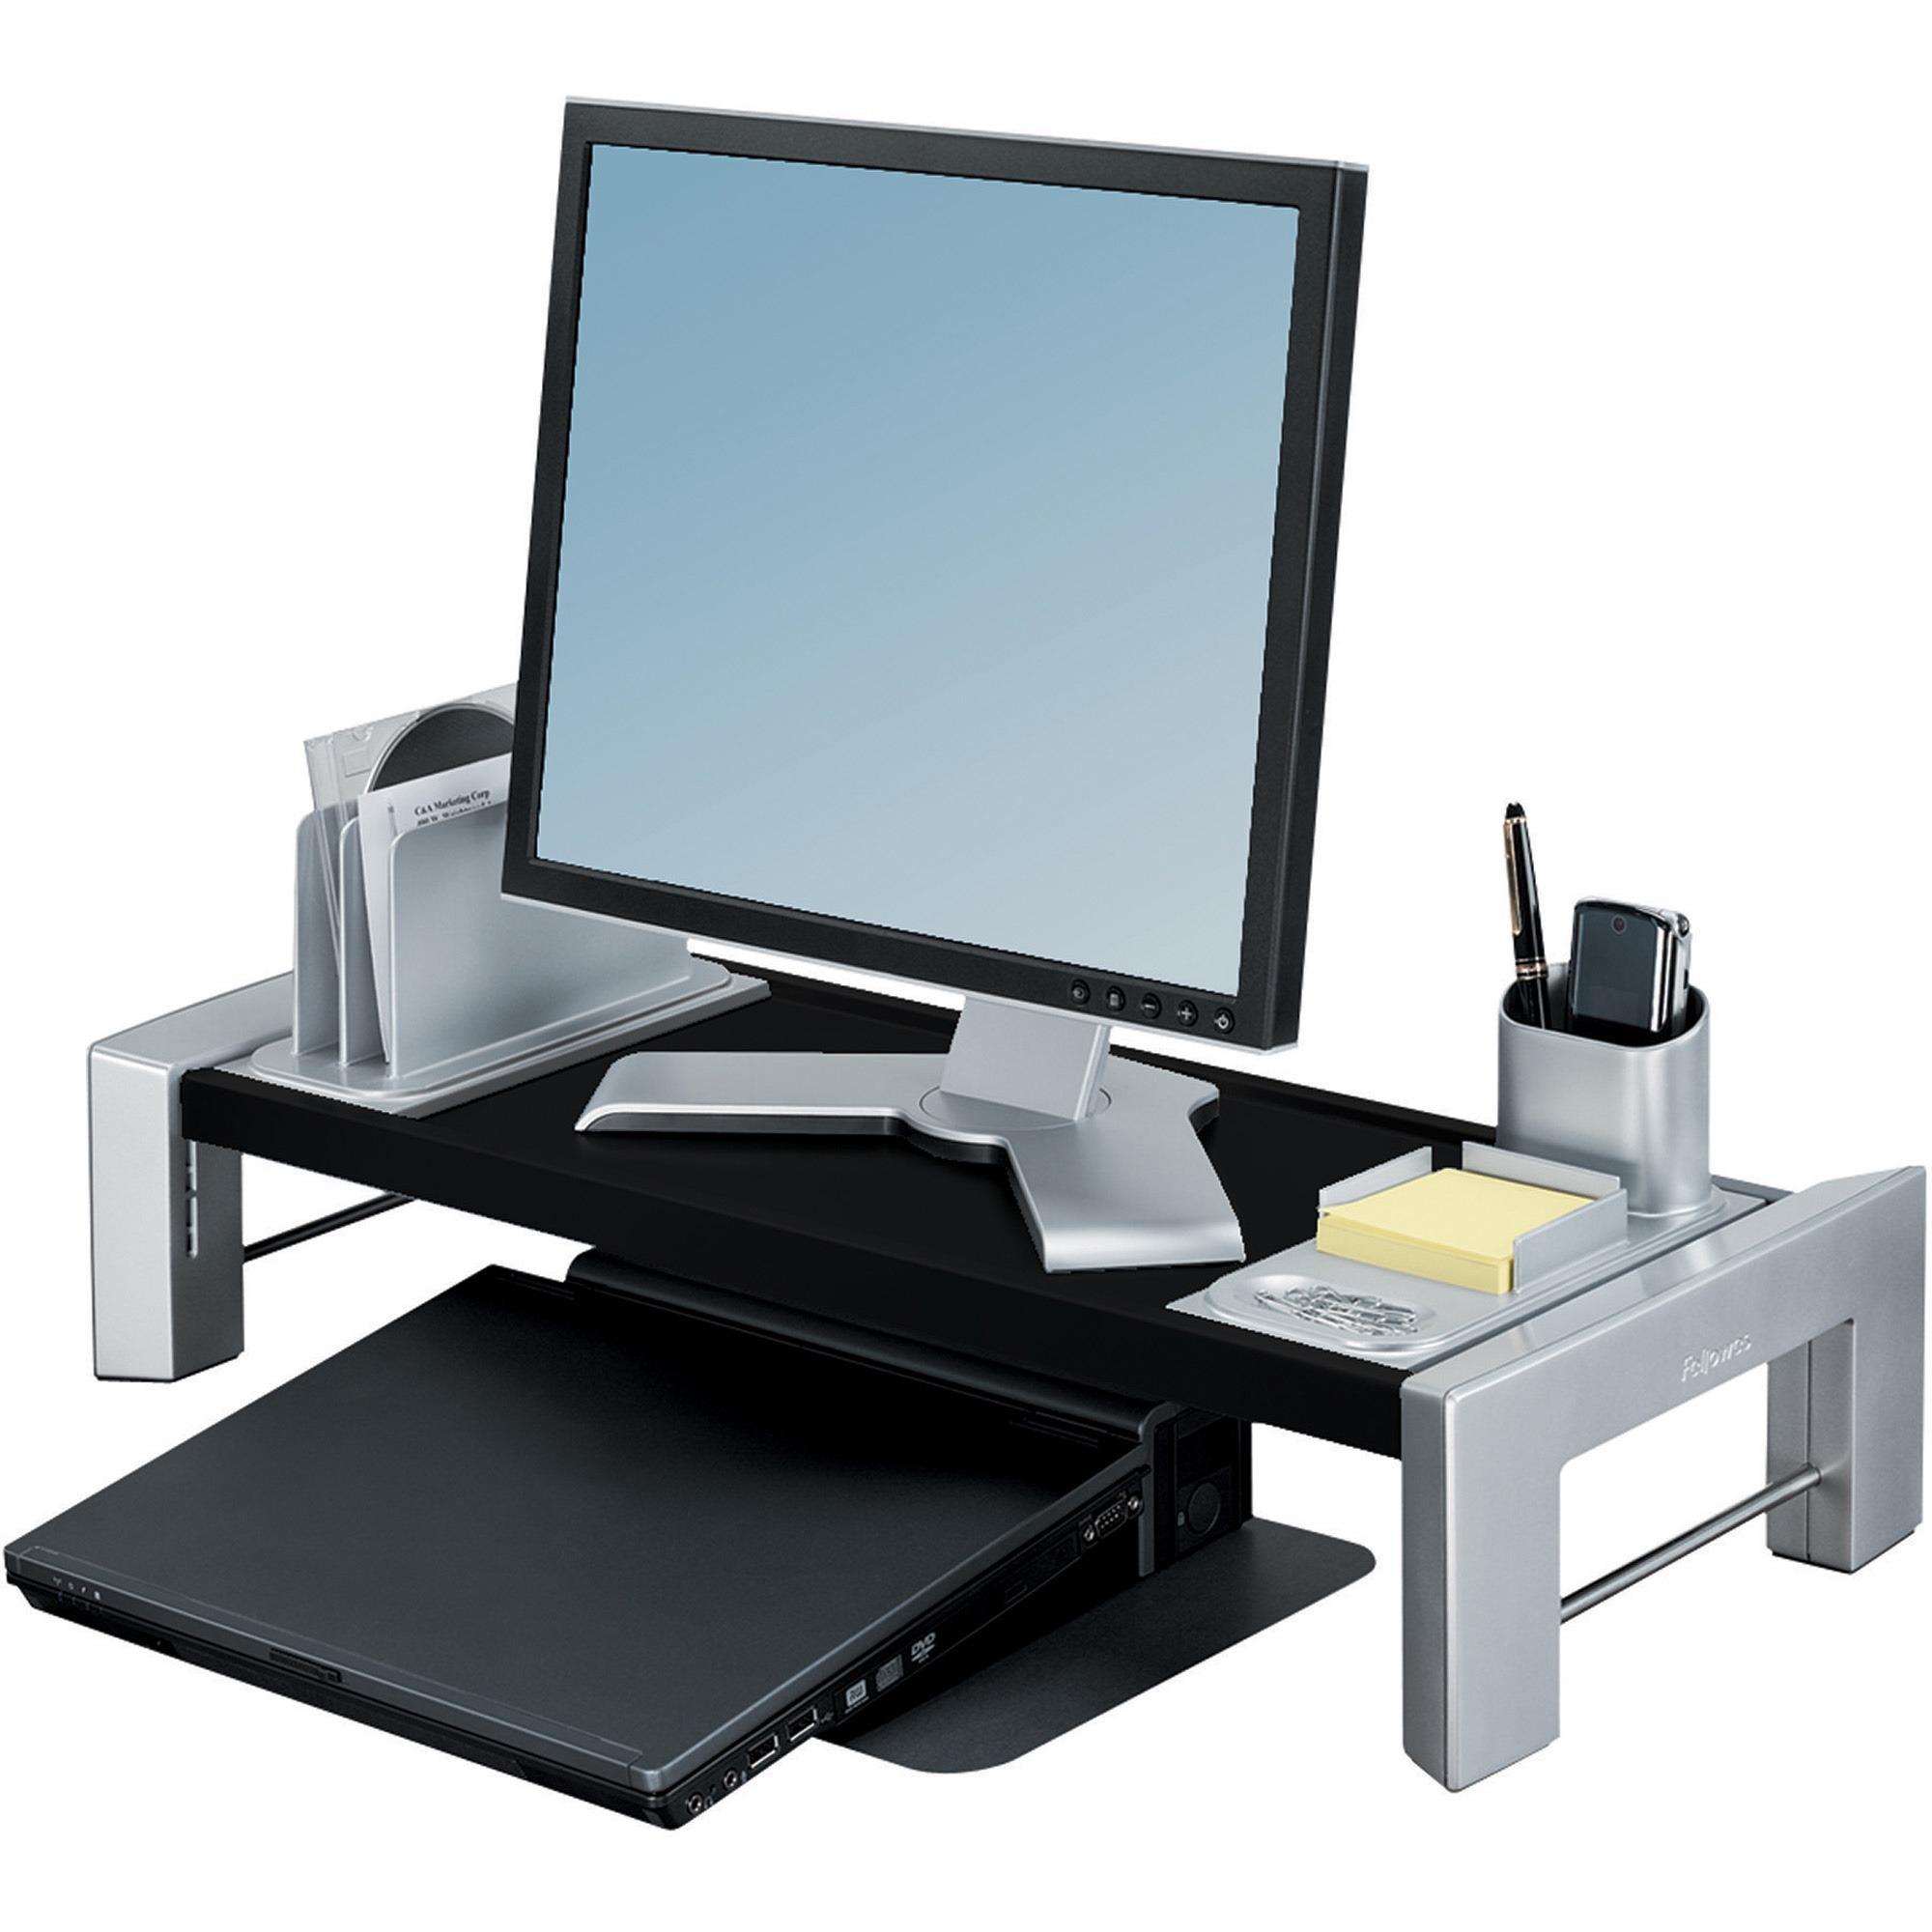 Professional Series Flat Panel Workstation, 25 7/8 x 11 1/2 x 4 1/2,Black/Silver